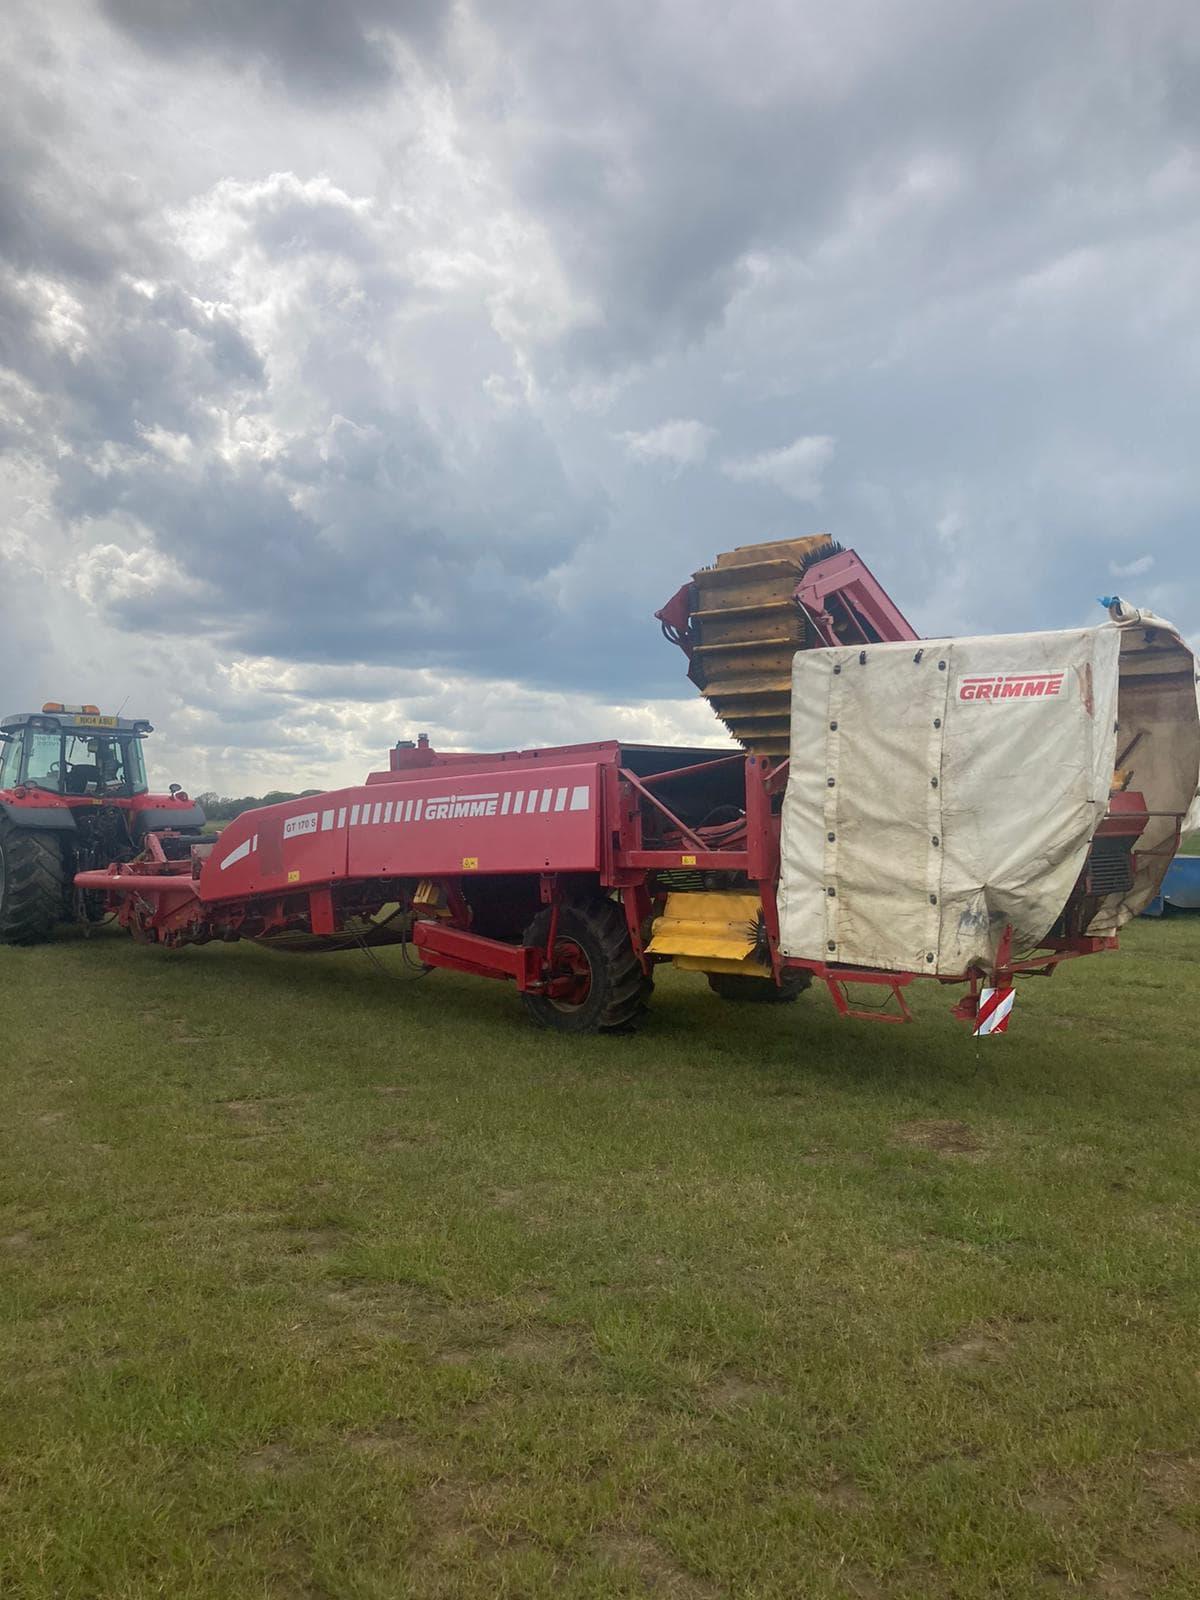 Grimme GT170S Potato Harvester